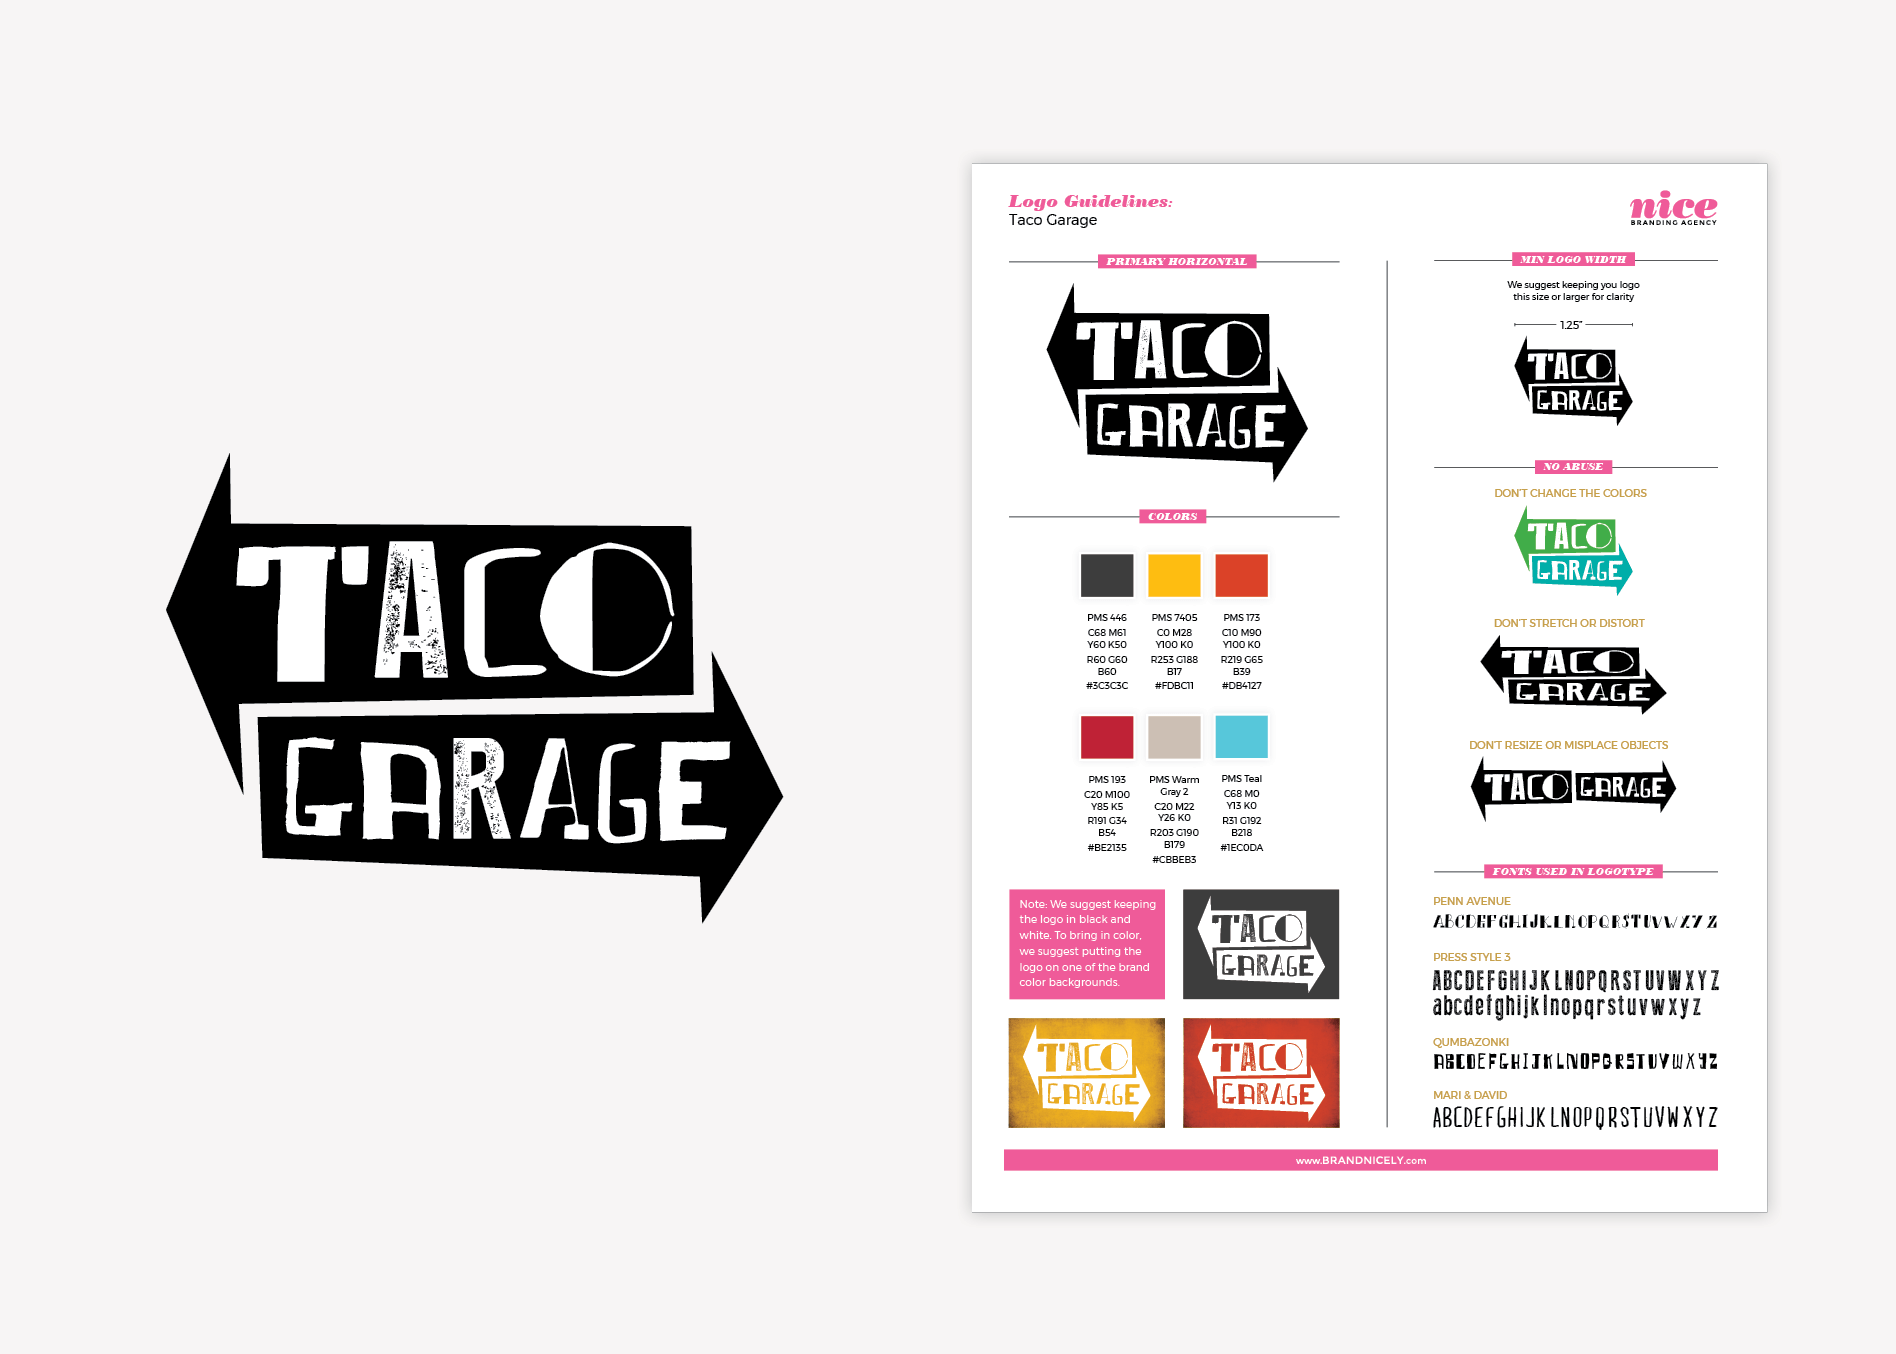 taco restaurant logo guidelines